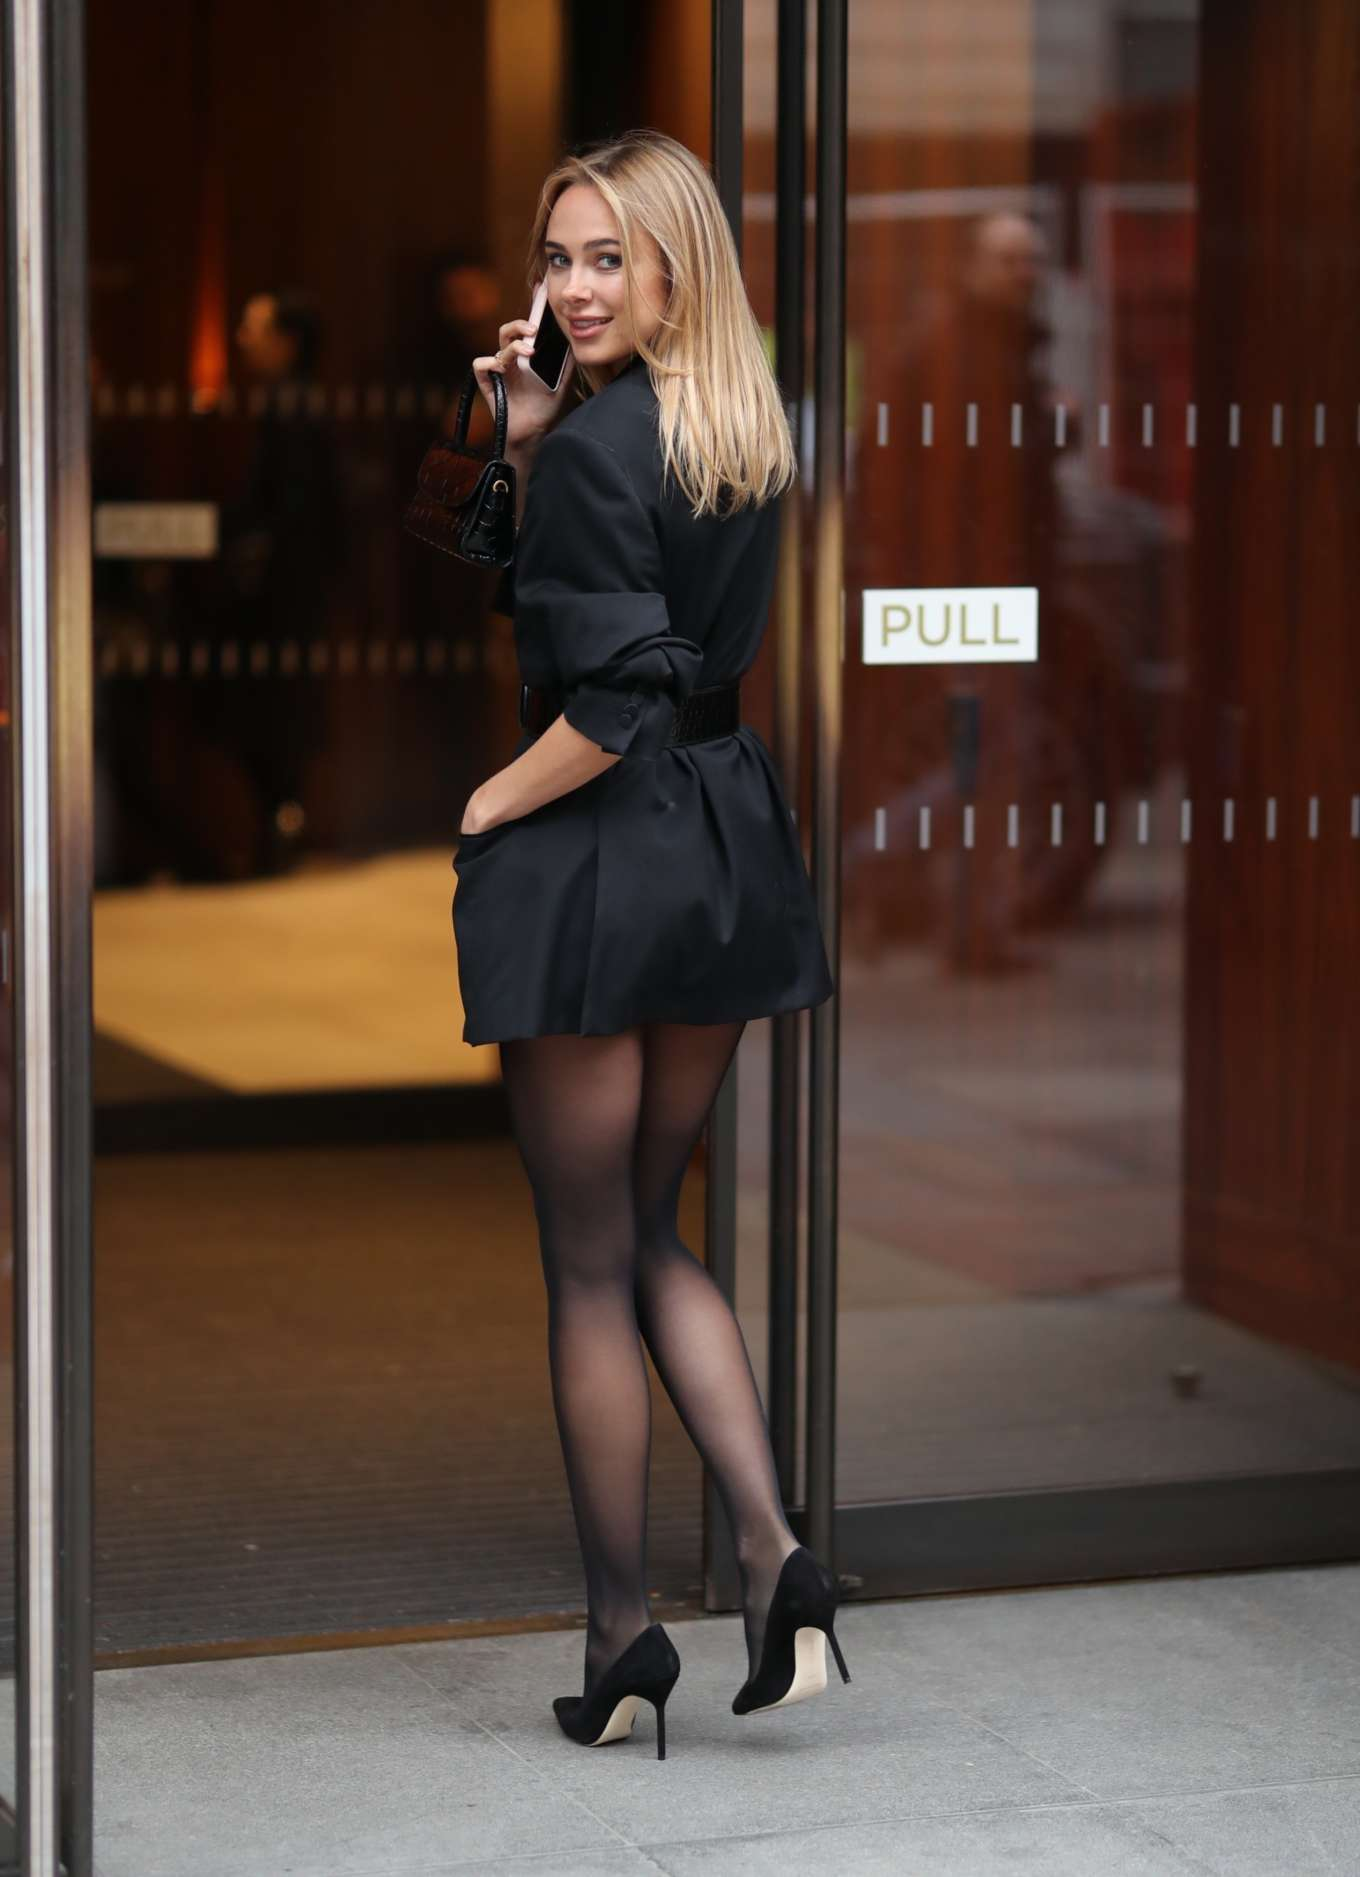 Kimberley Garner - Atelier Zuhra show at 2020 London Fashion Week